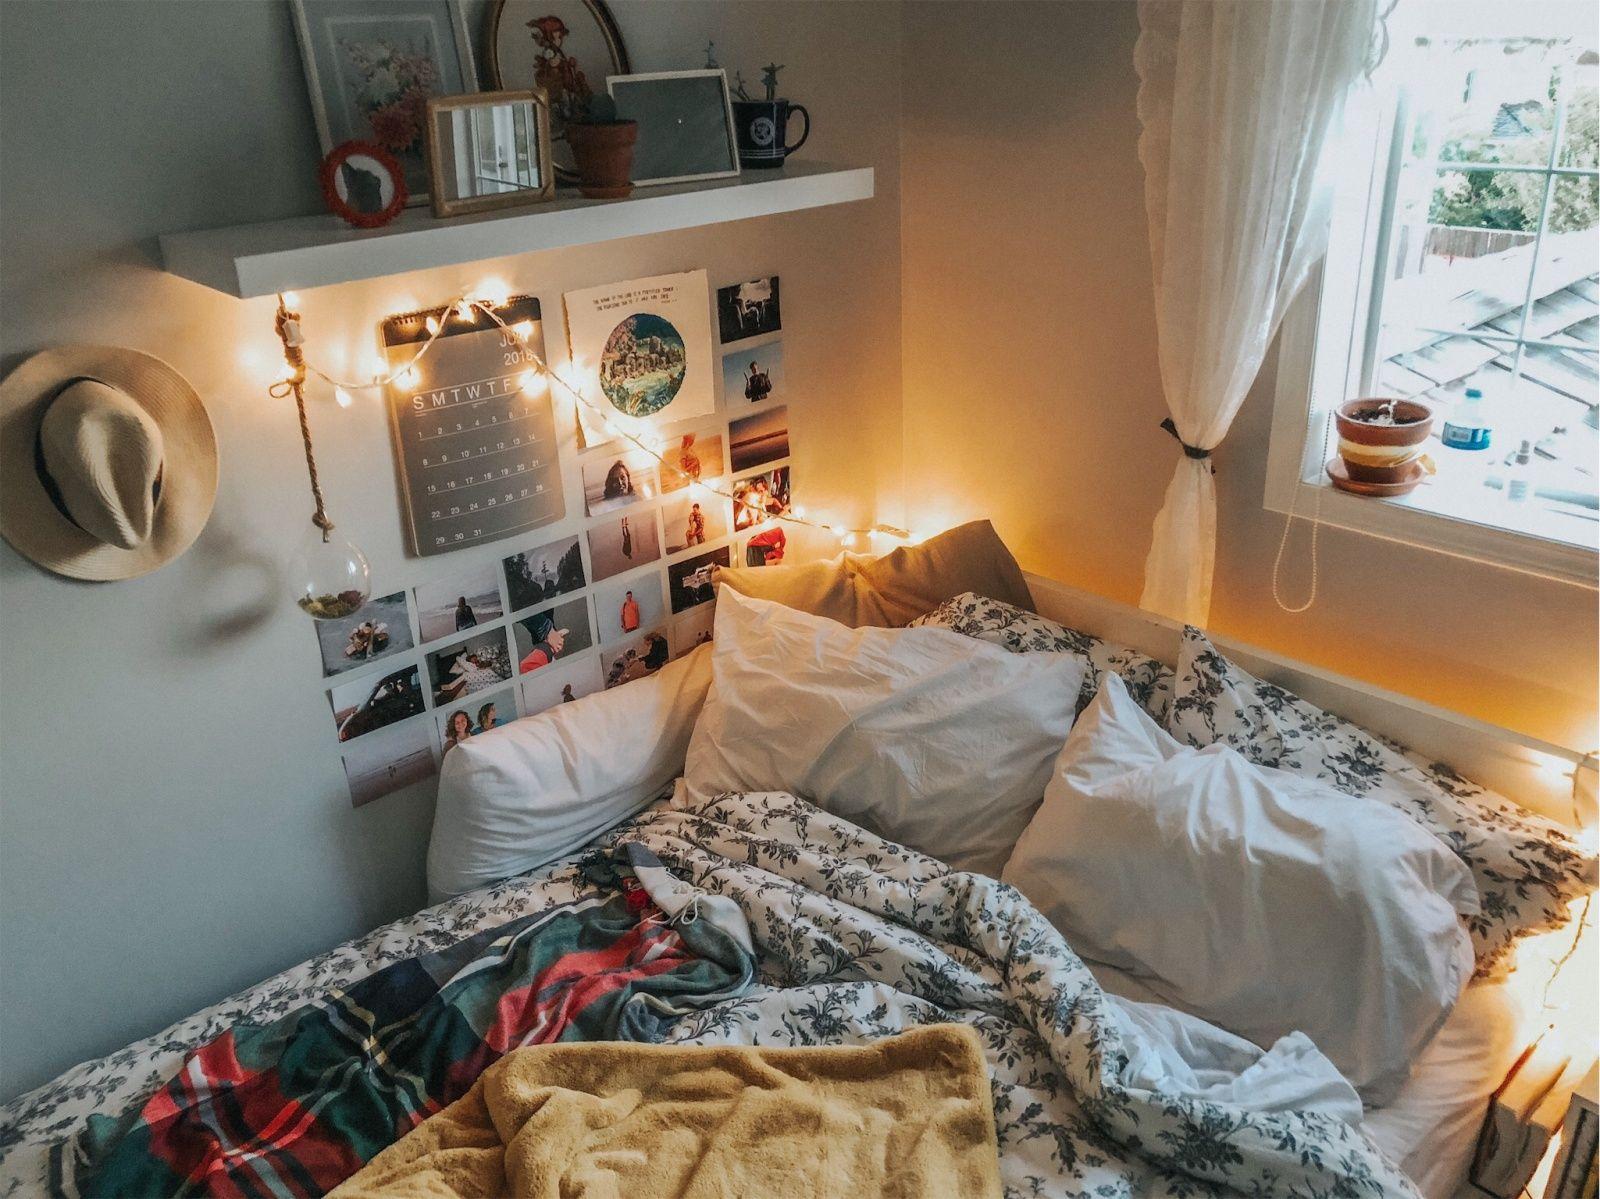 Room Roominspo Cozy Room House Rooms Dorm Room Inspiration